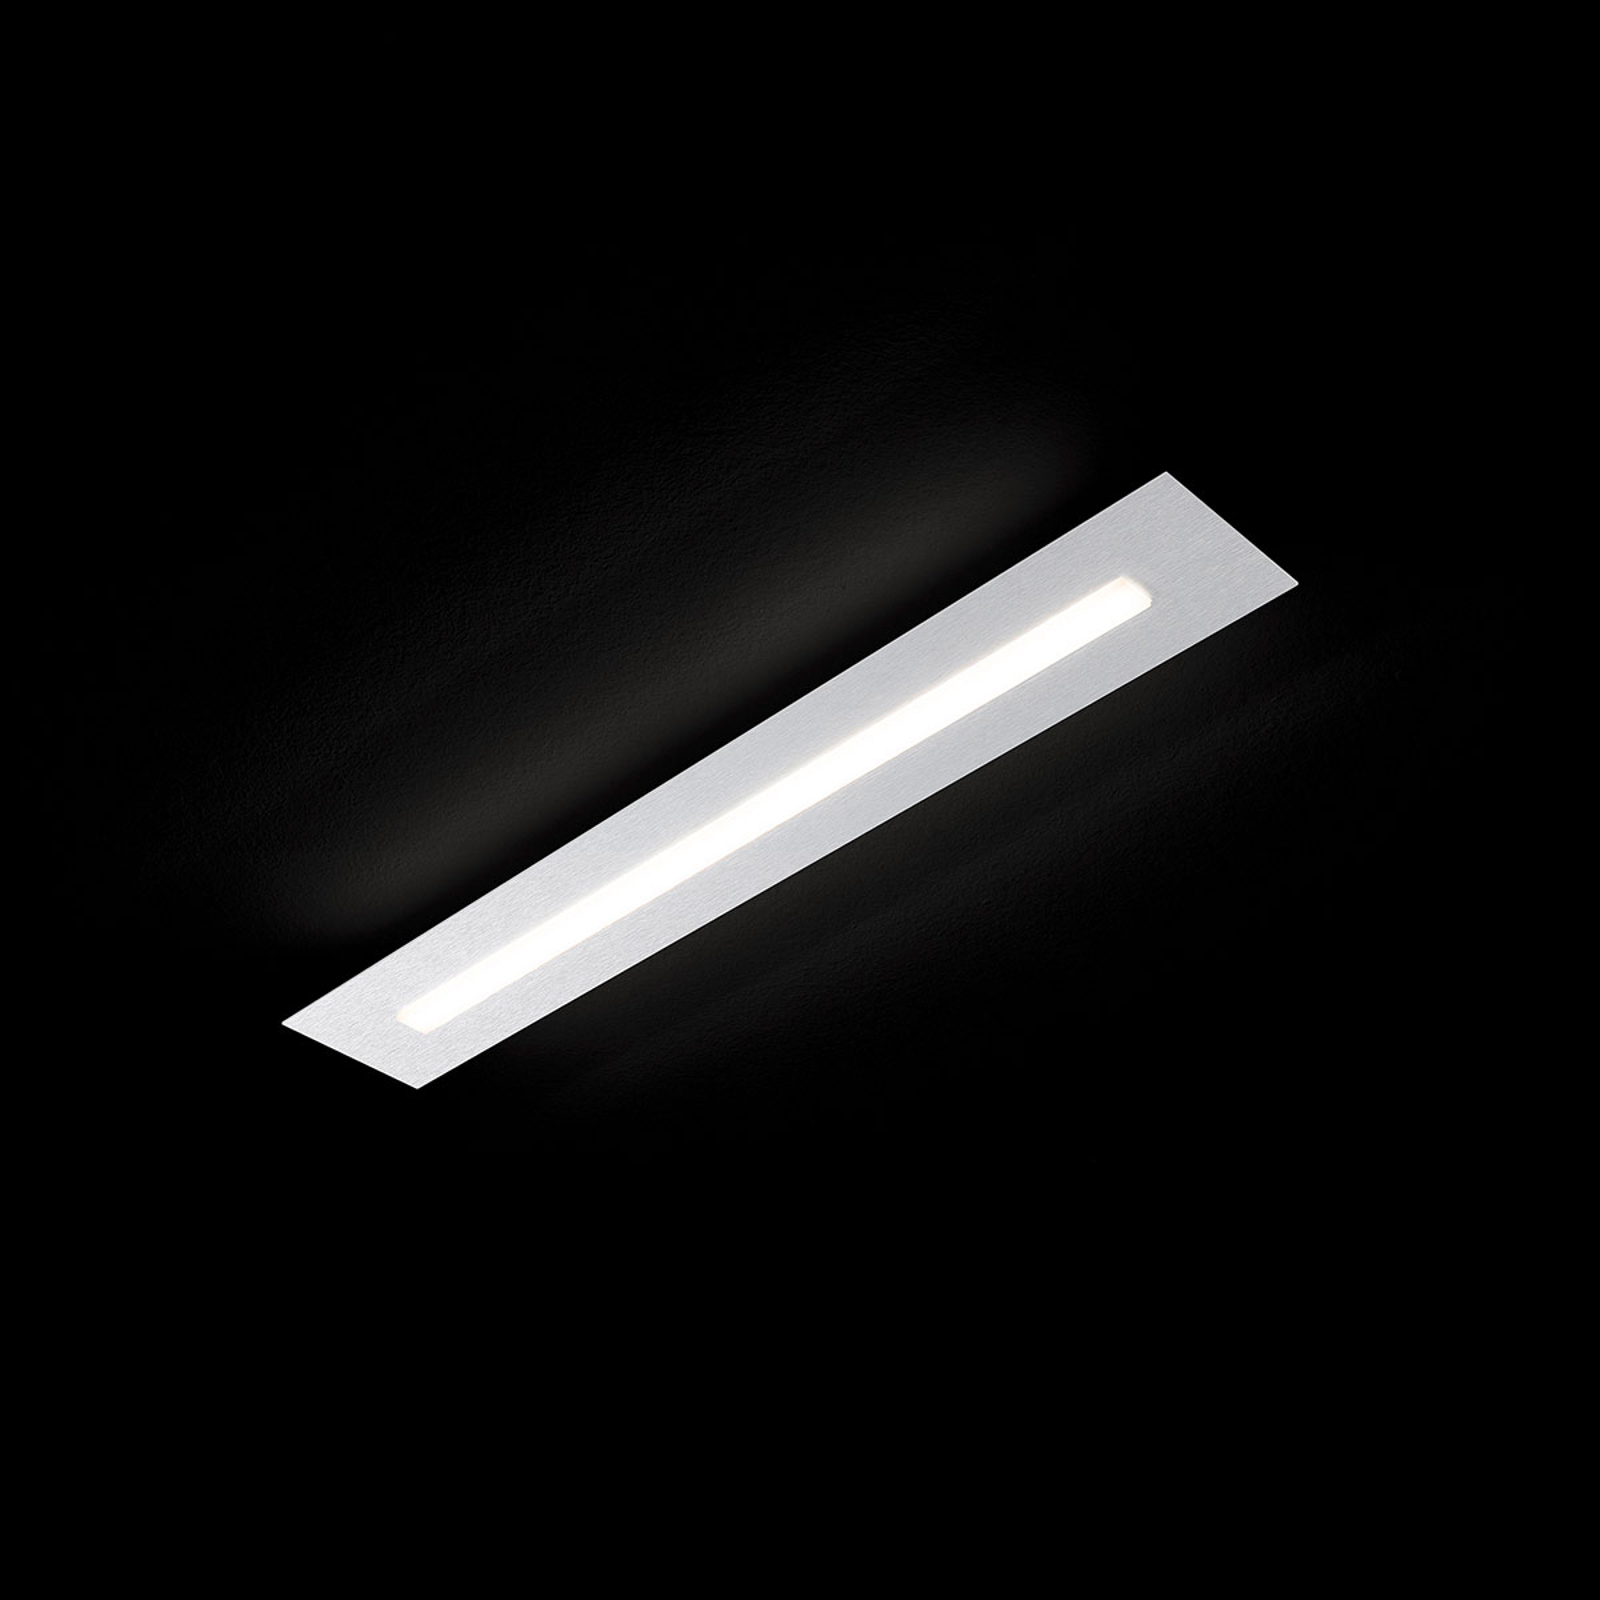 GROSSMANN Fis lampa sufitowa LED, 57 cm